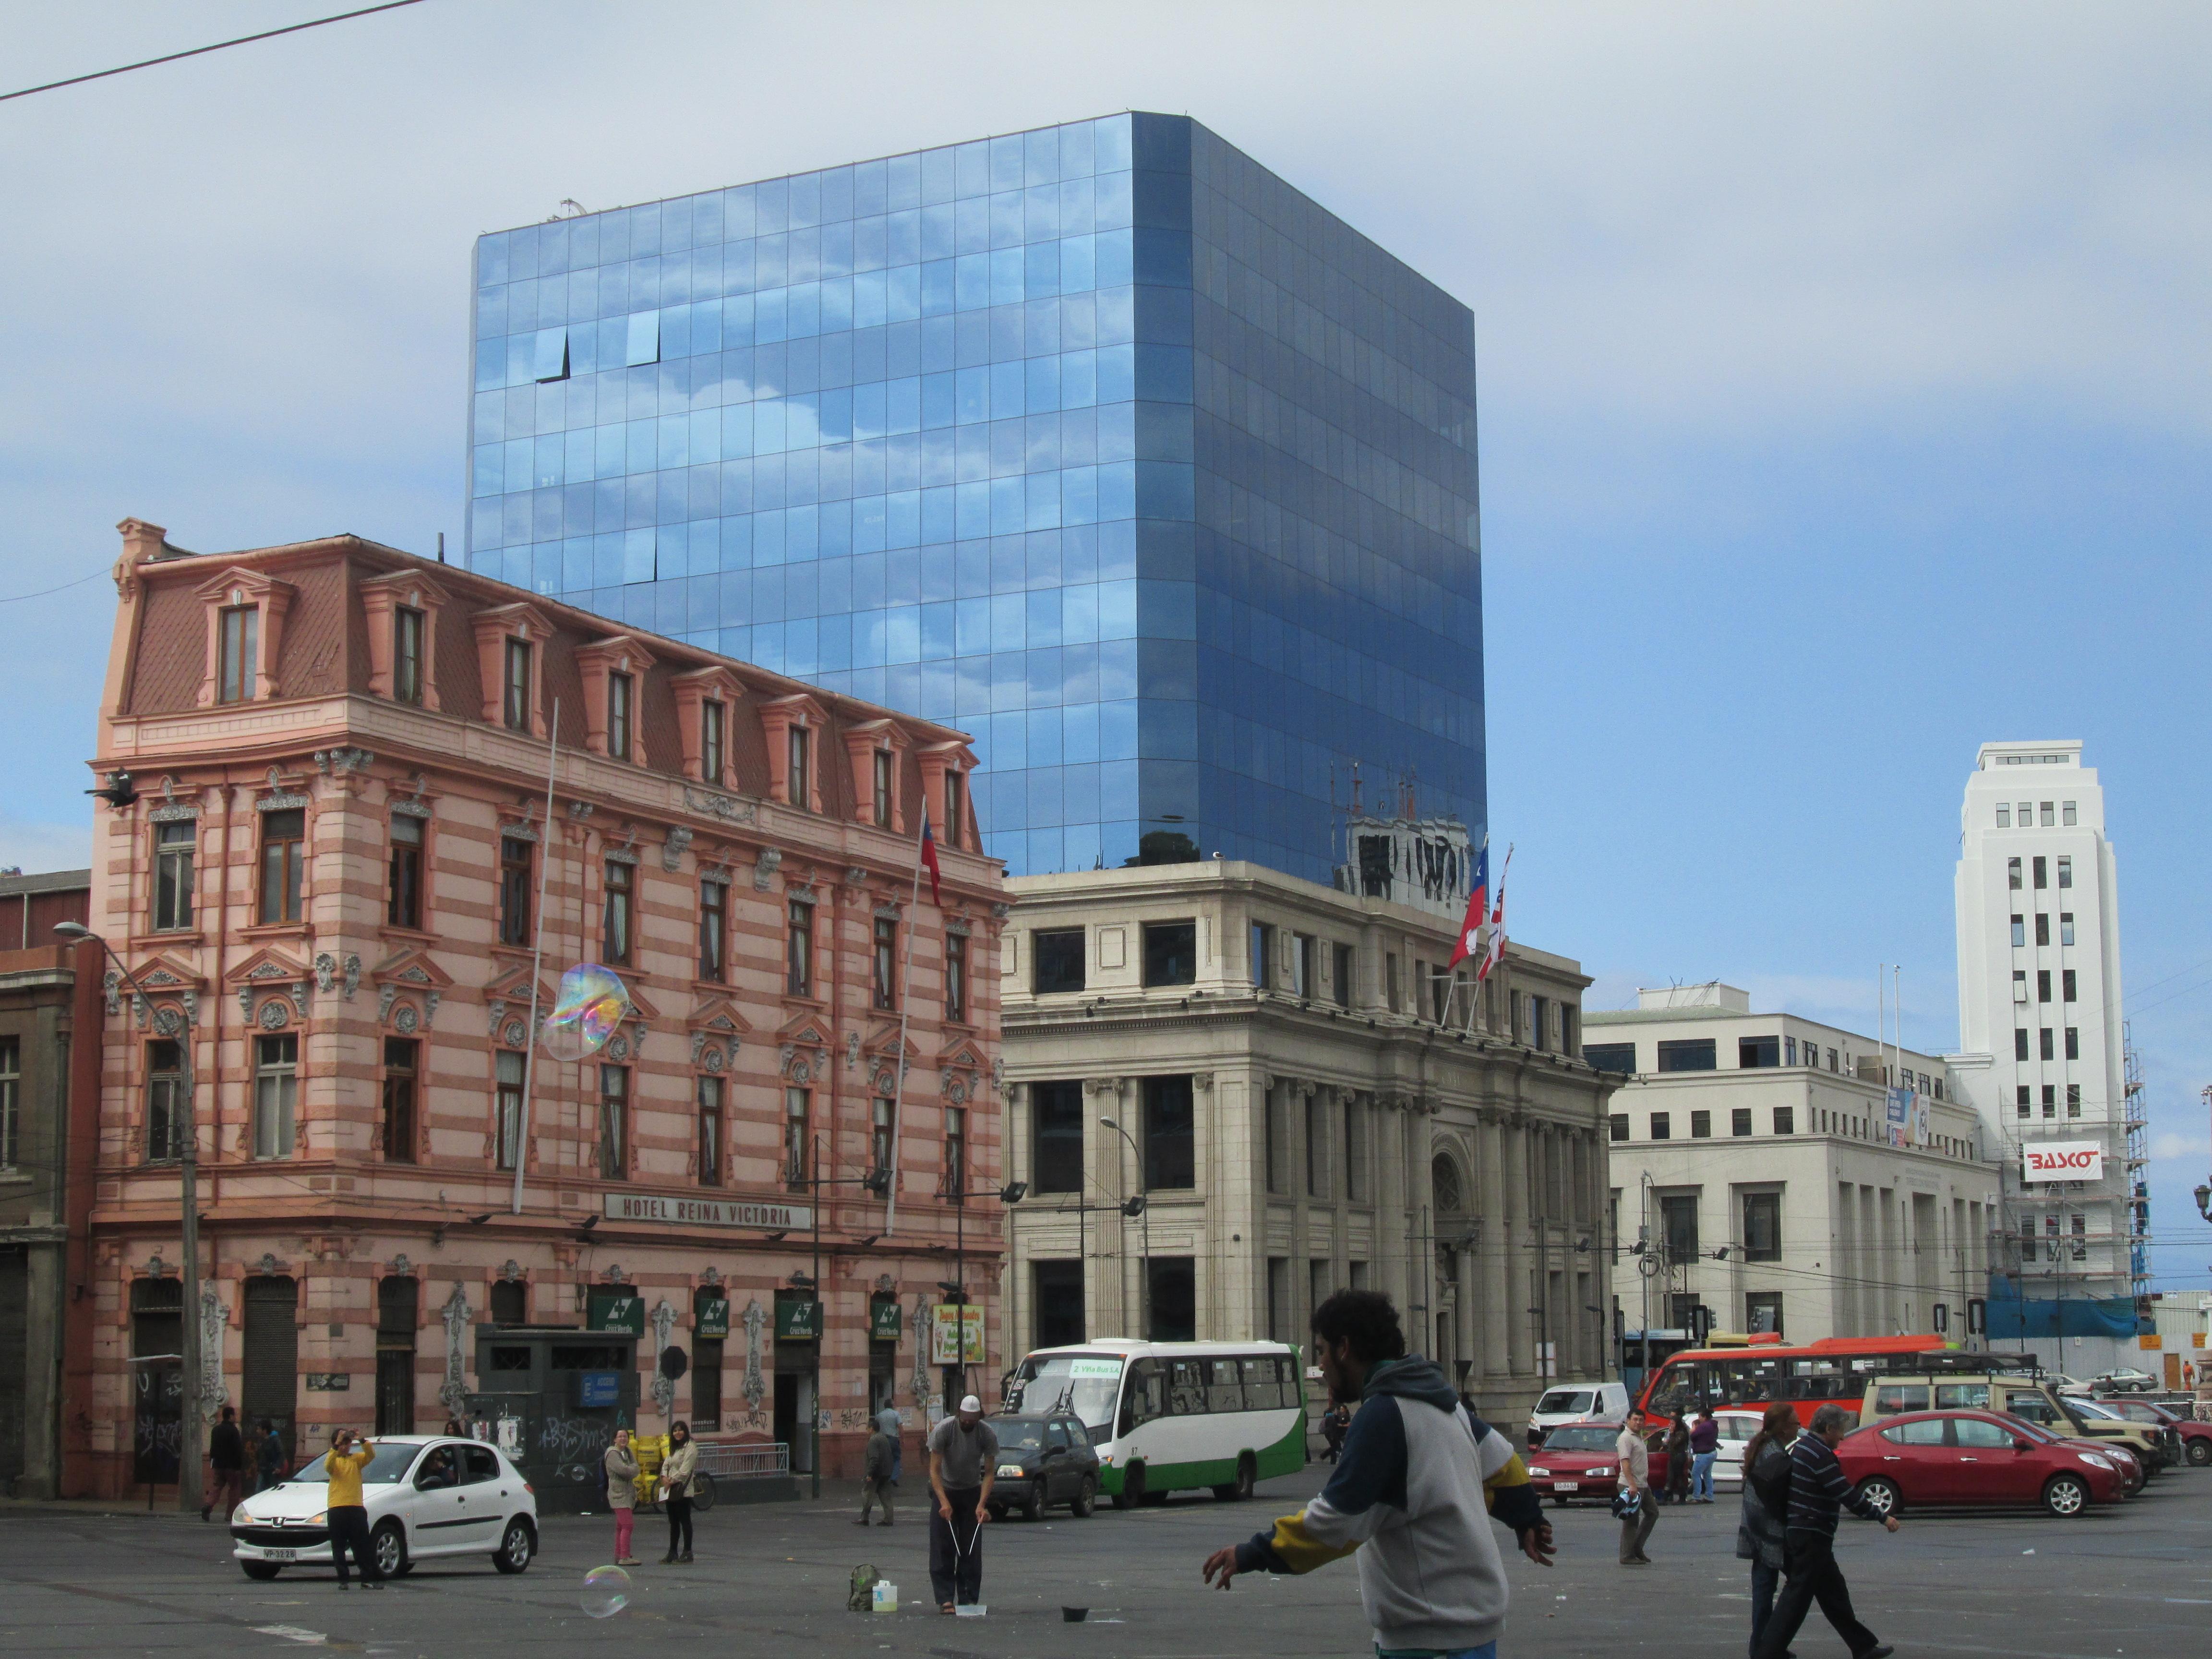 Hotel Reina Victoria